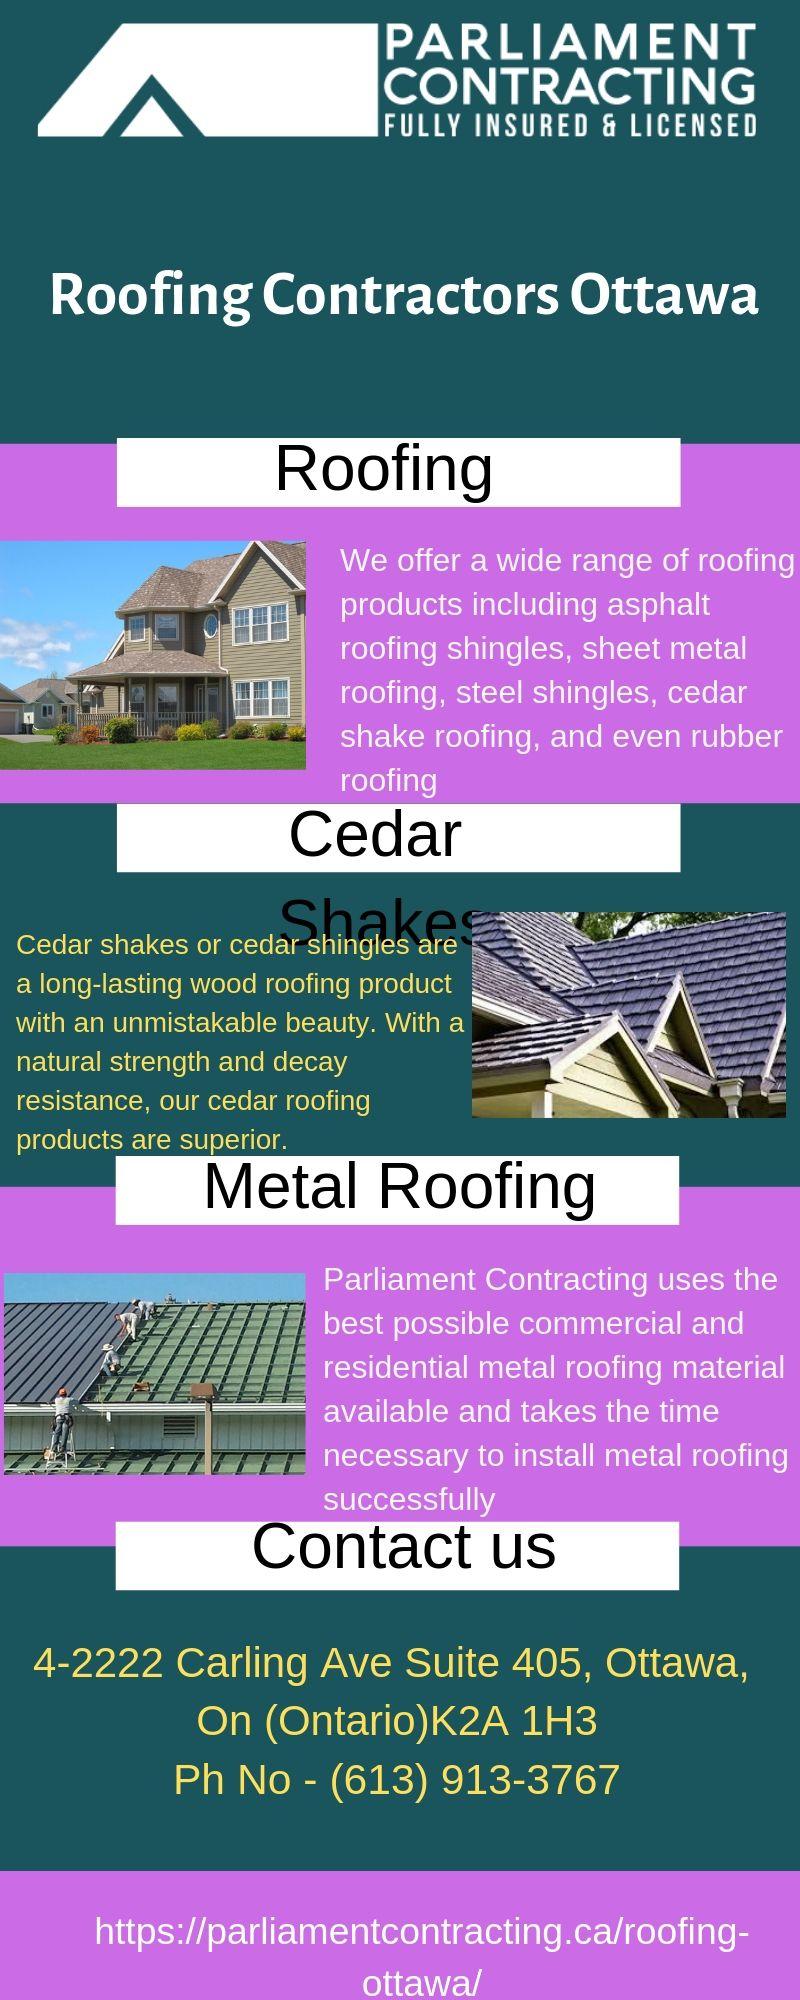 Roofing Contractors Ottawa Parliament Contracting Roofing Roofing Contract Roofing Contractors